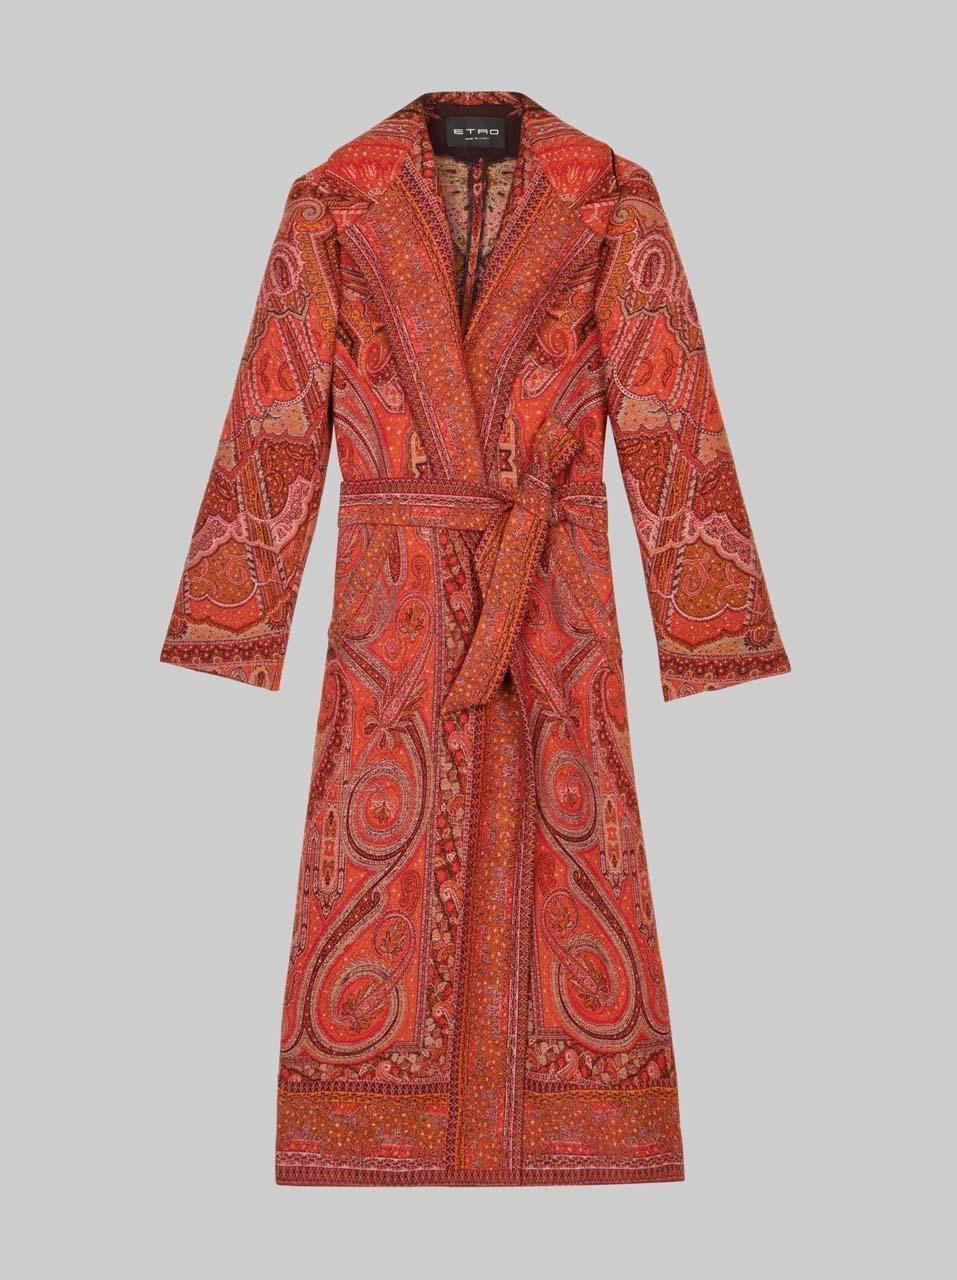 Etro Paisley Wool Coat $4,470 _1